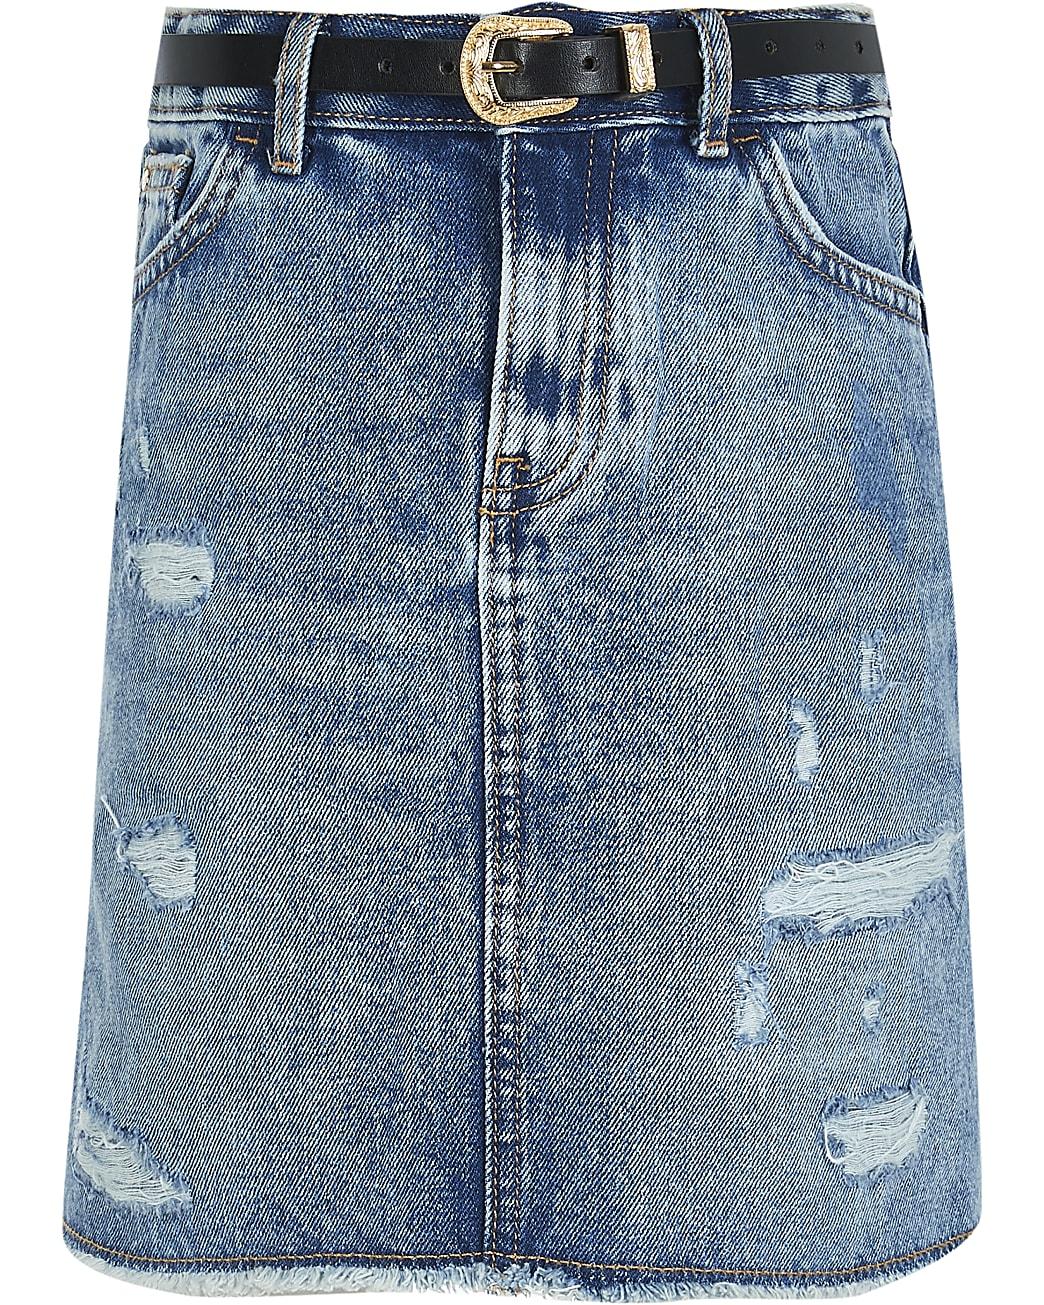 Girls blue authentic wash denim skirt